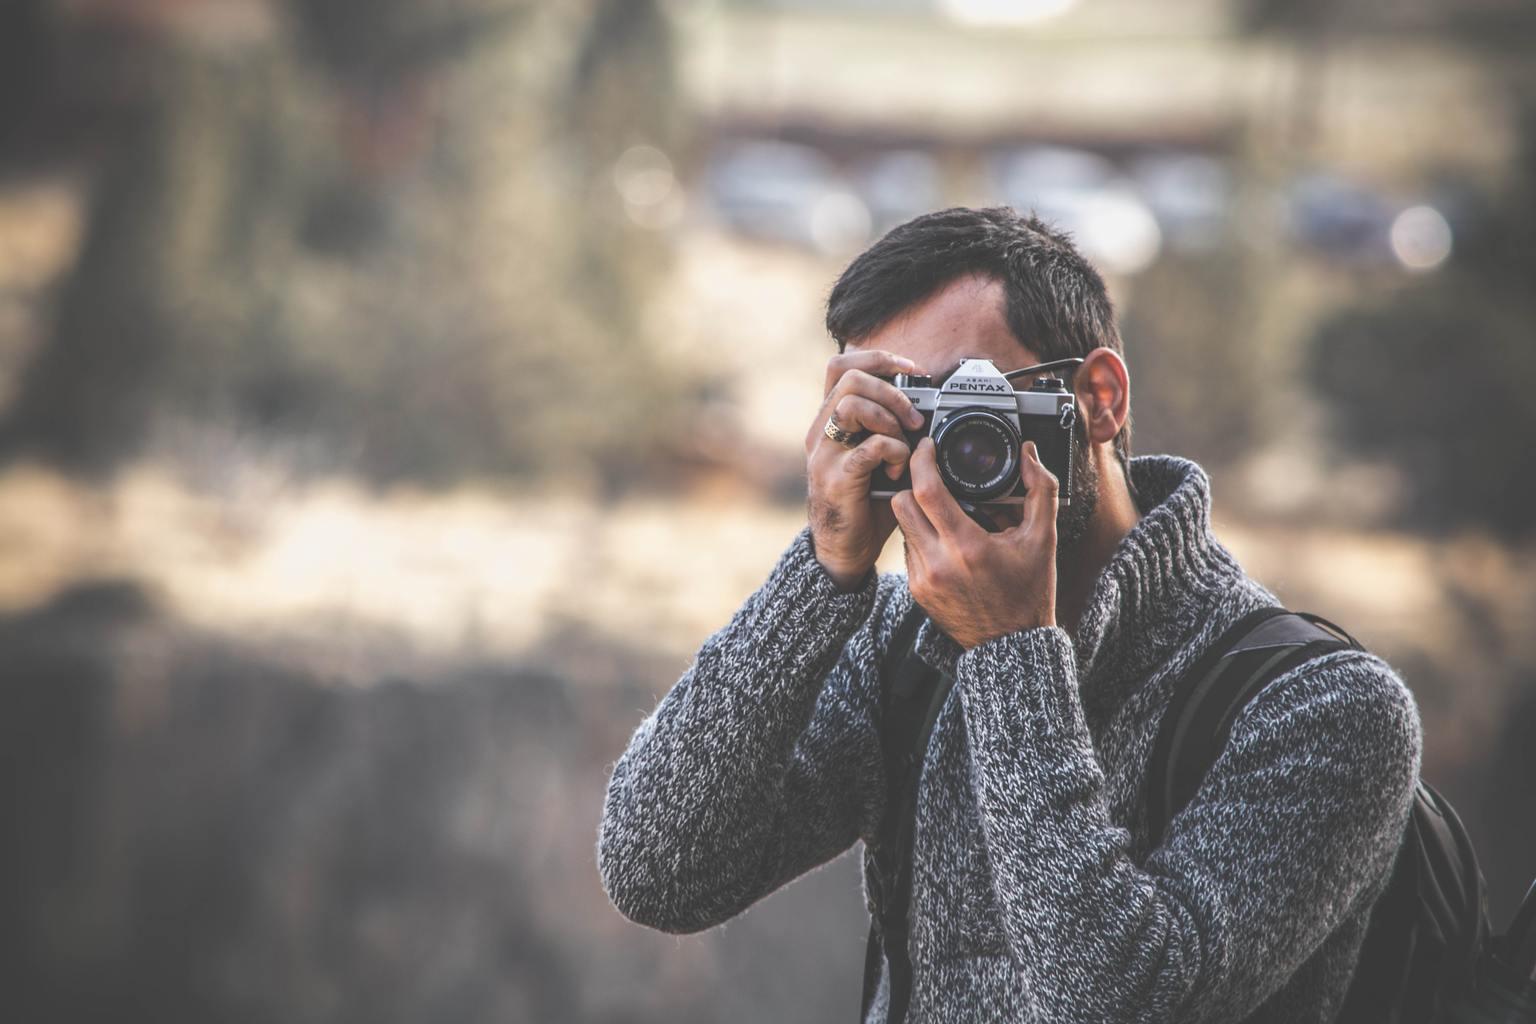 Fotógrafo tomando una foto con una Pentax